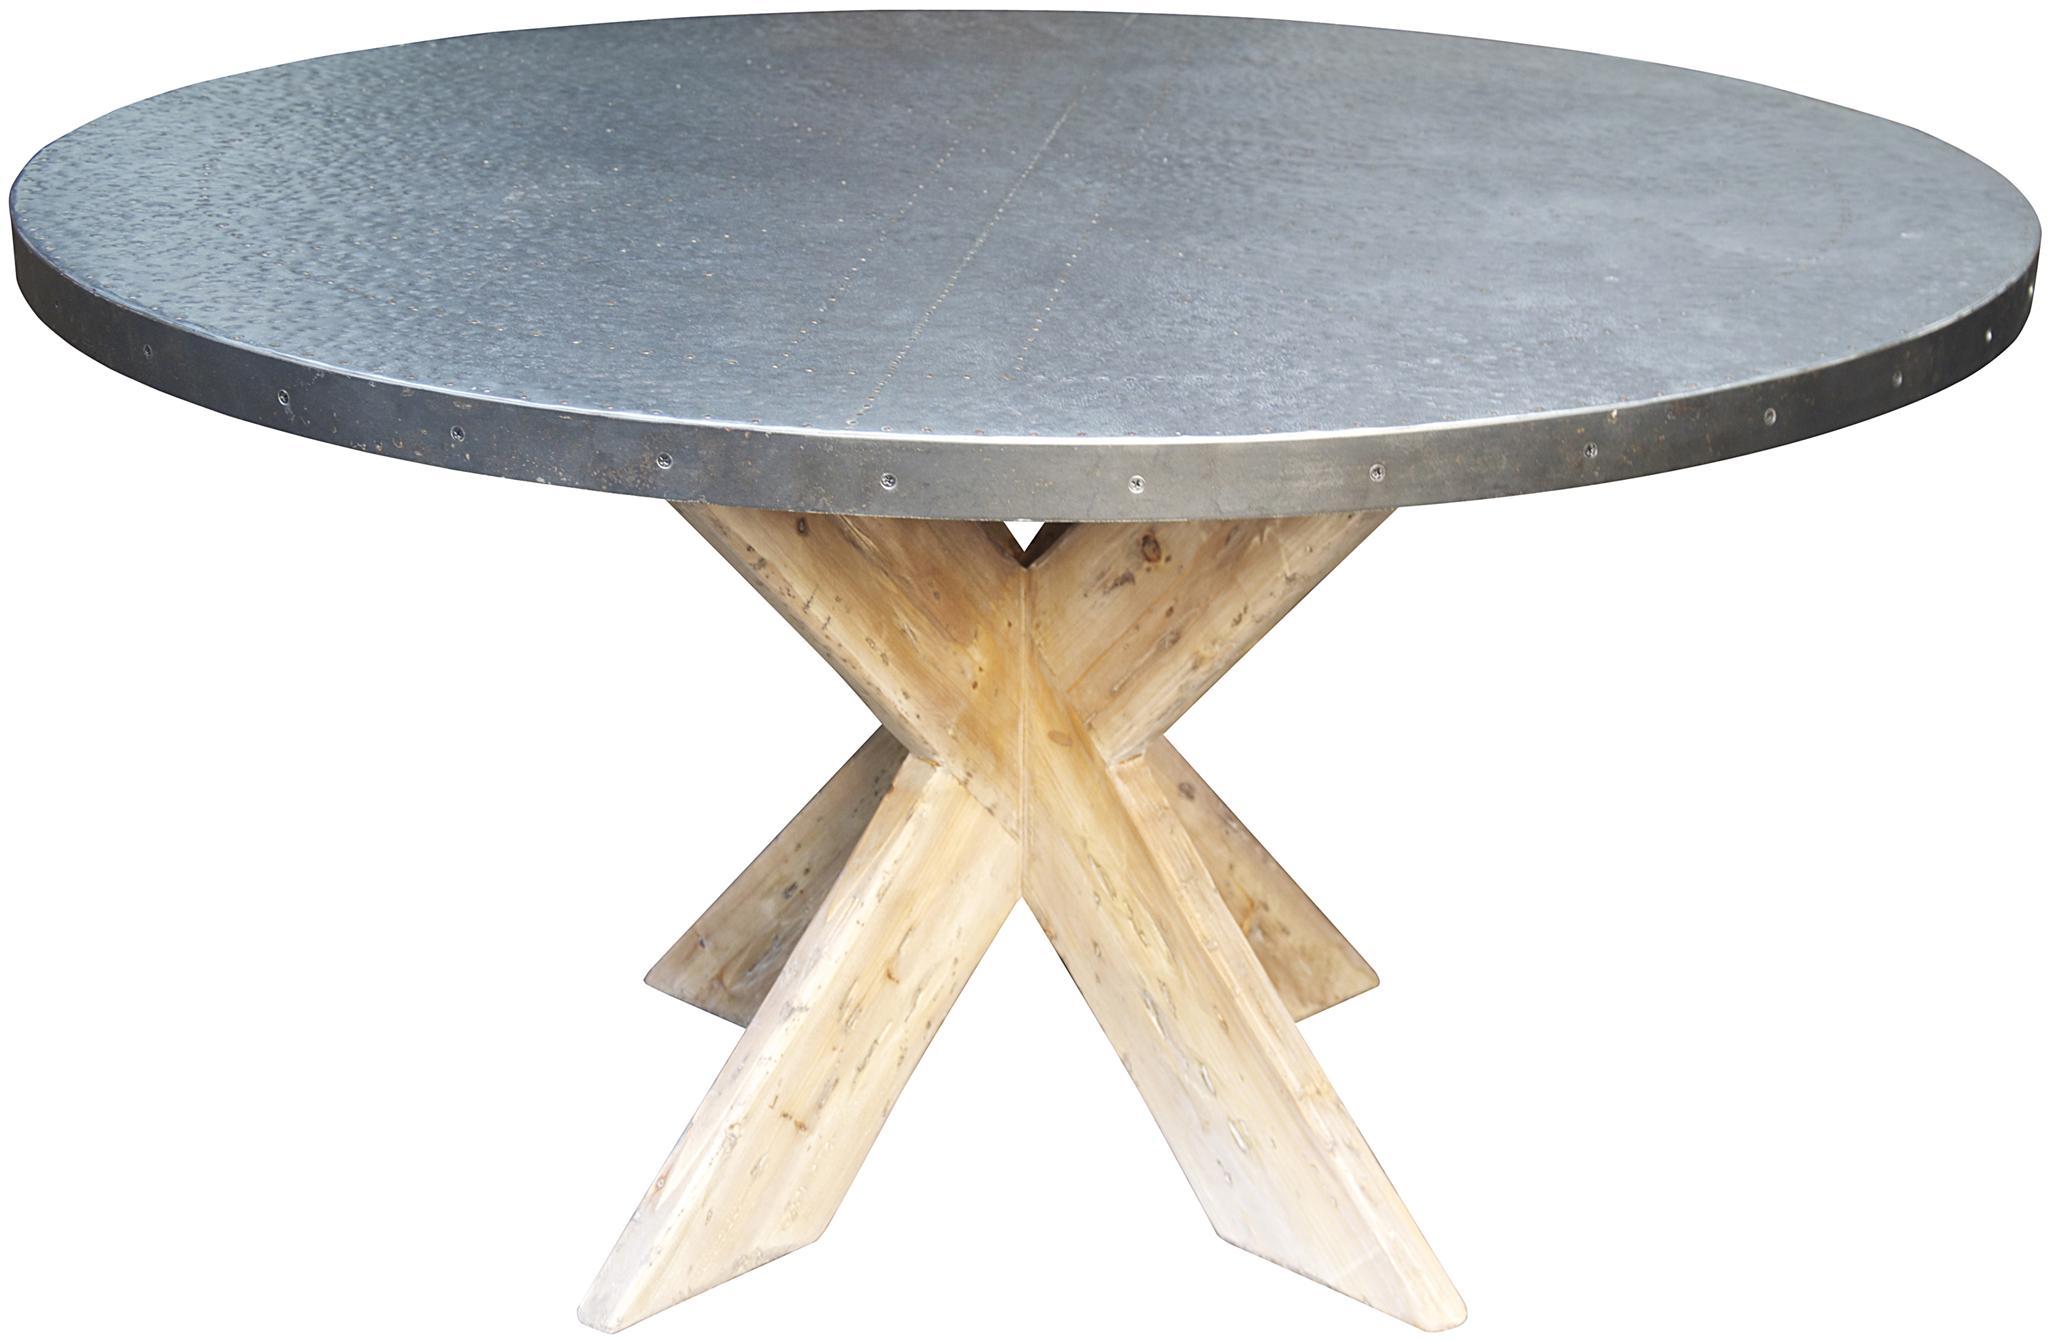 "Austin Table with Zinc Top 54"" dining tables noir"